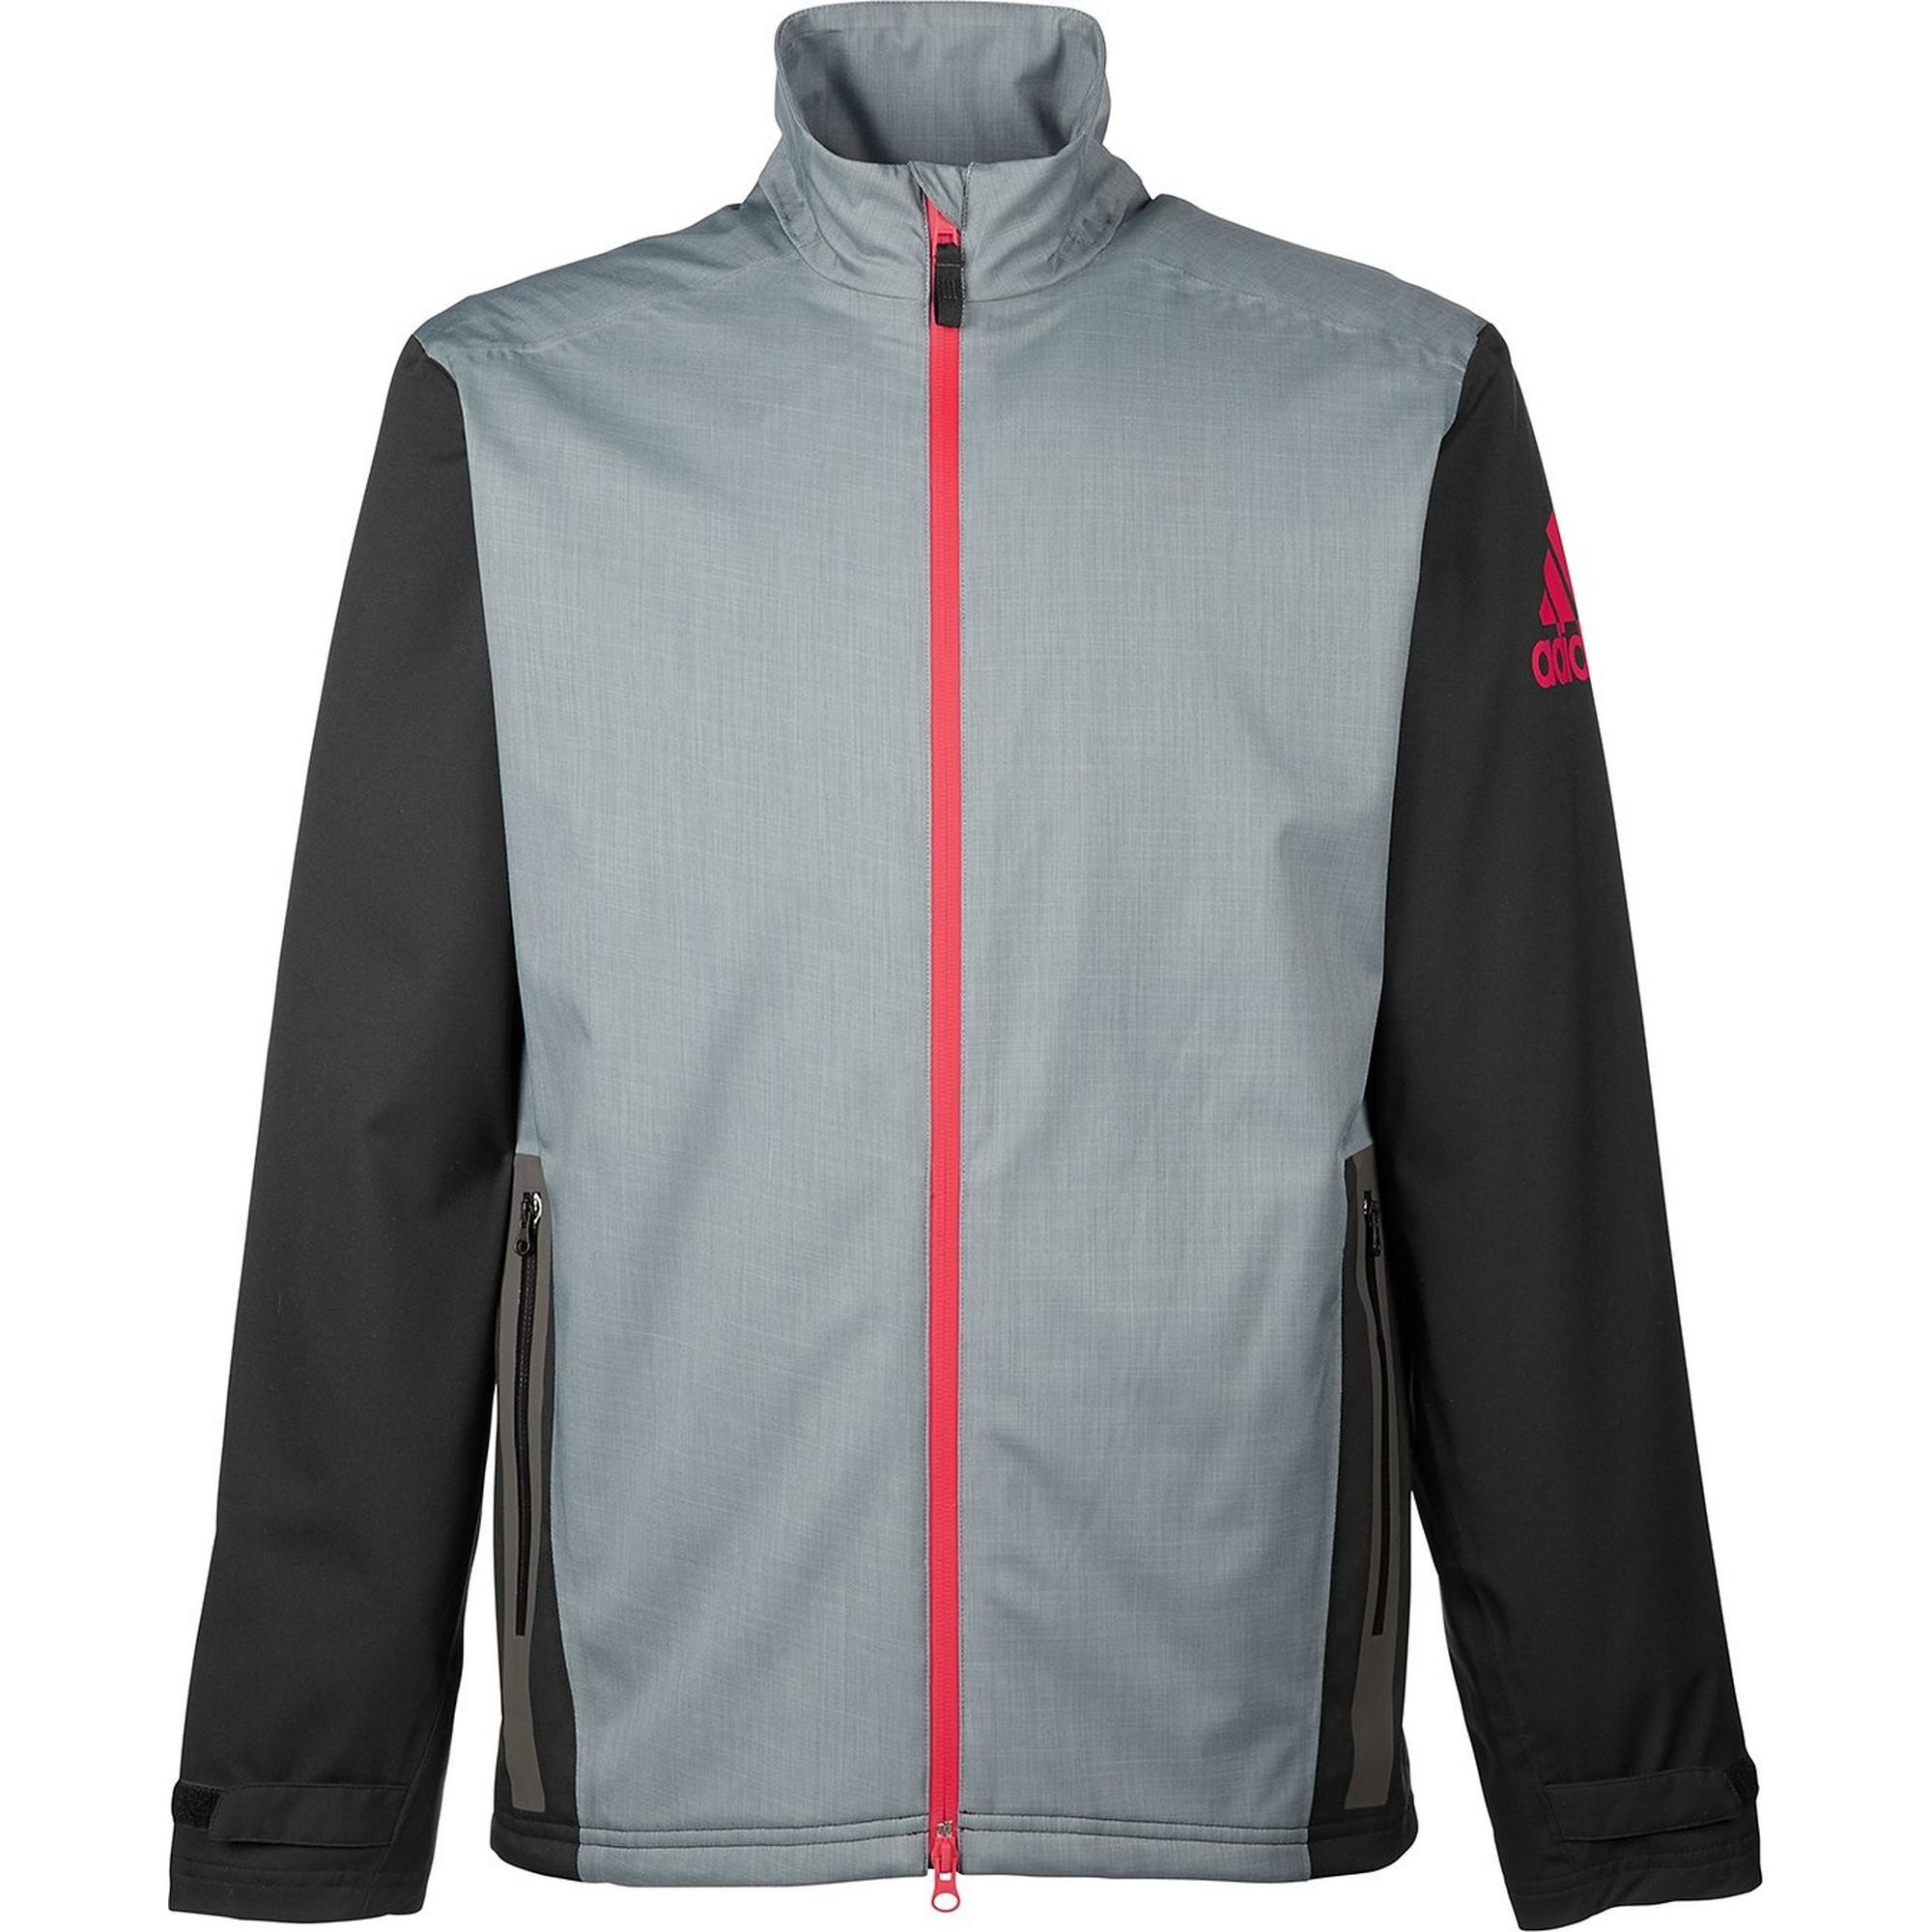 Men's Climaproof Heather Stretch Full Zip Jacket